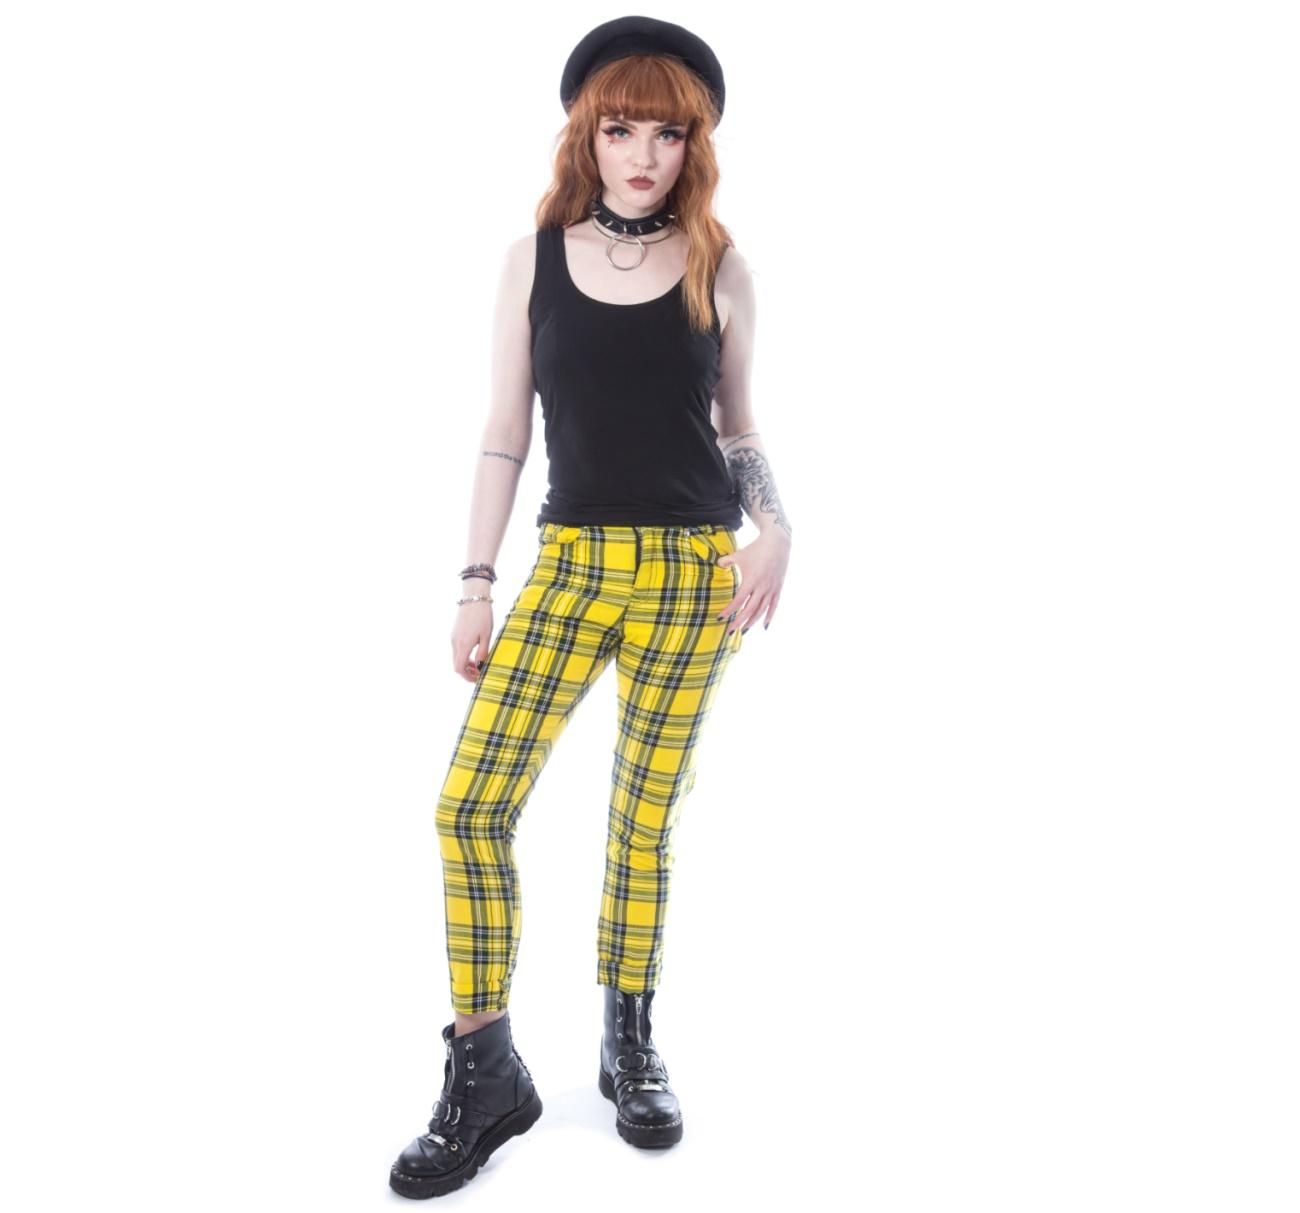 Ladies Tartan Pant Gelb Chemical Black Chemical Black Hosen Gothic Onlineshop Gothic Punk Rockabilly Shop Details Xyliapant Punk